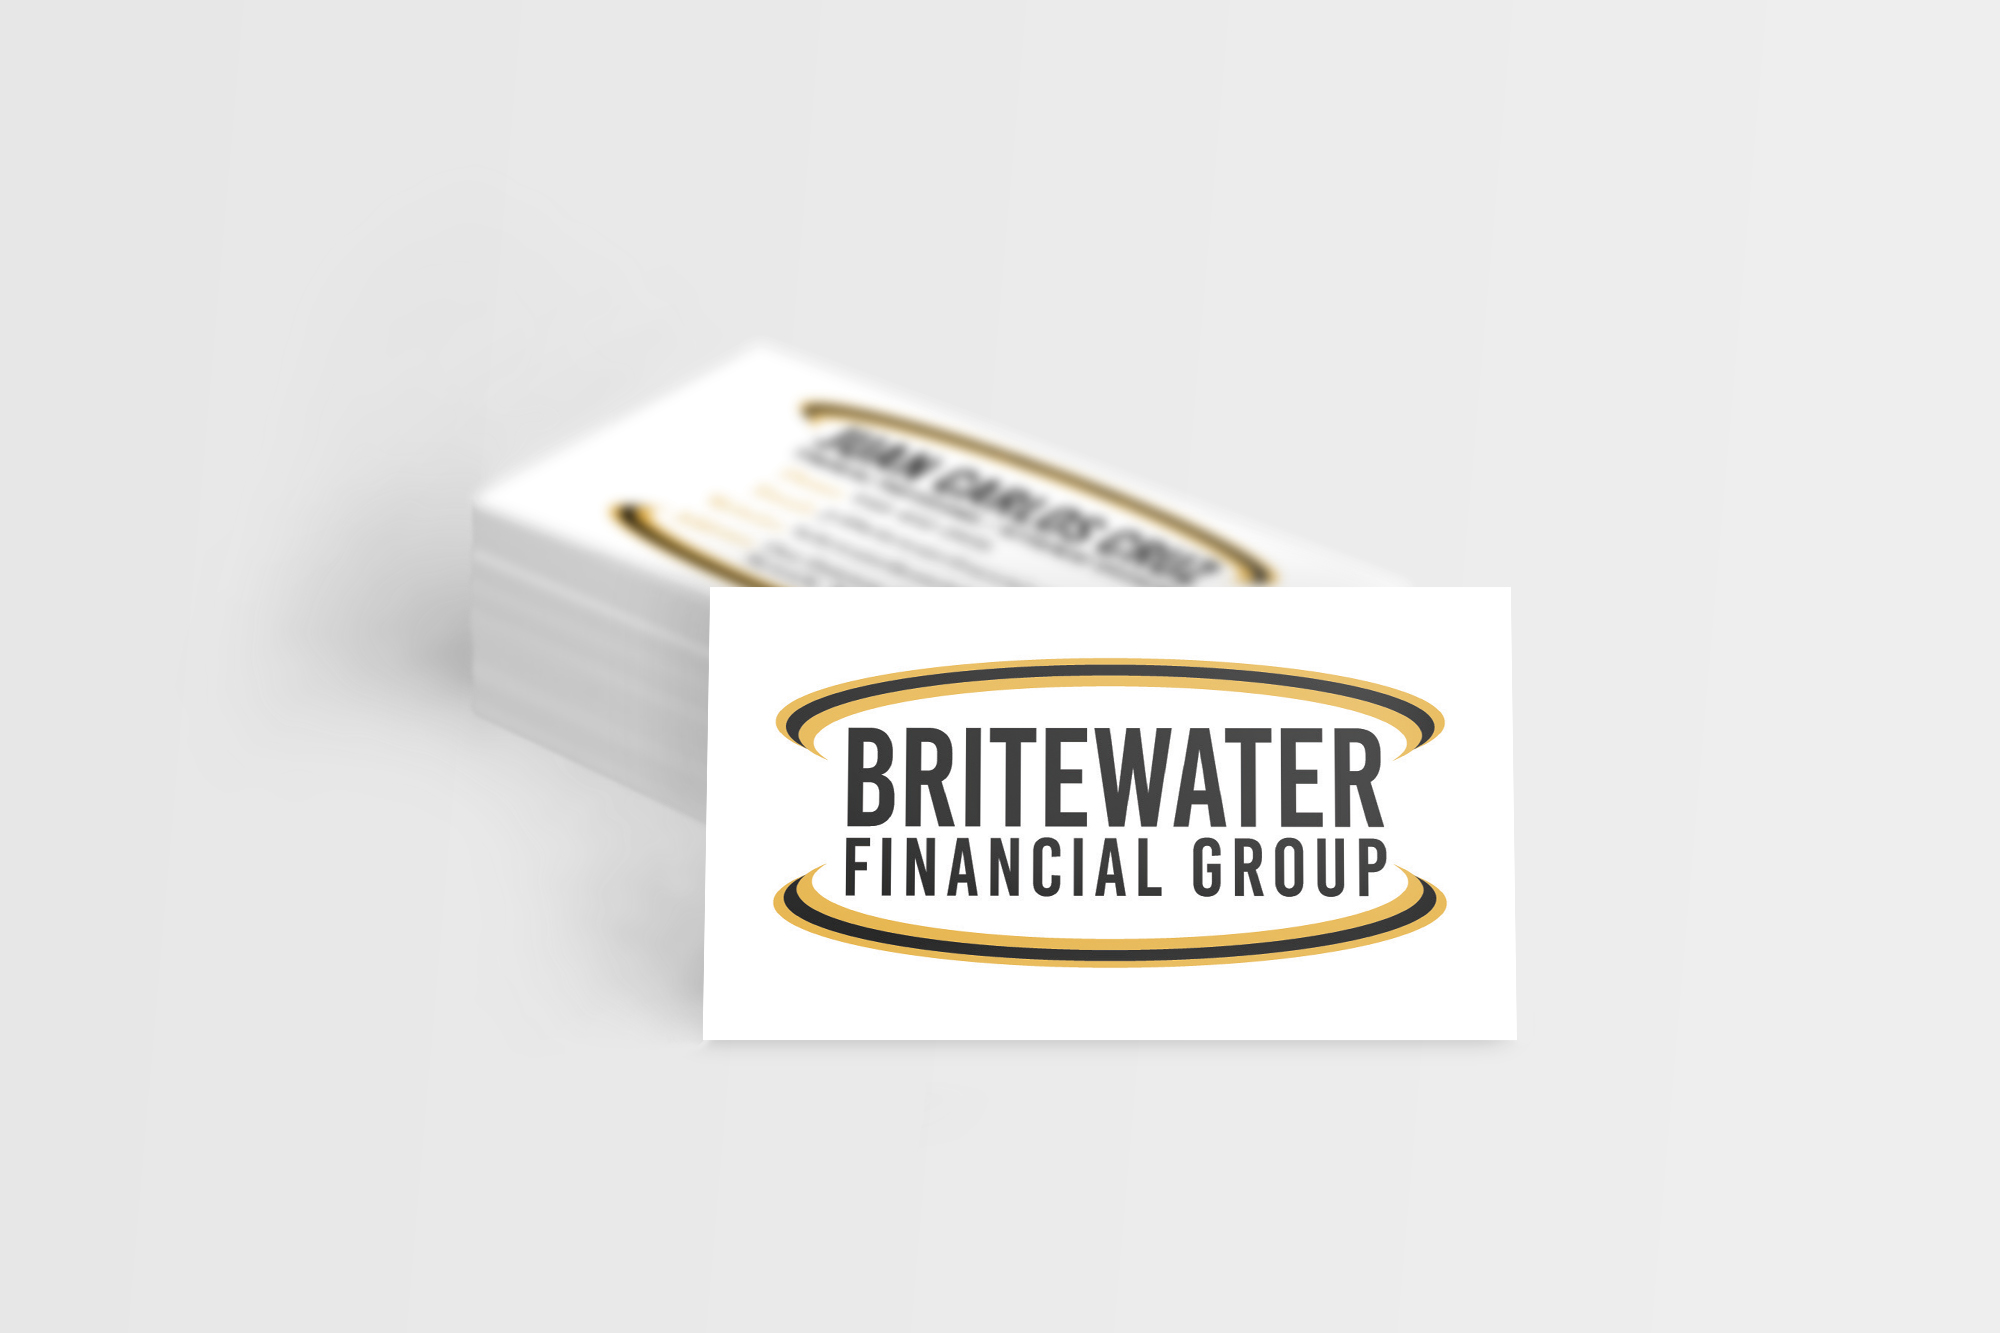 Britewarer Financial Group